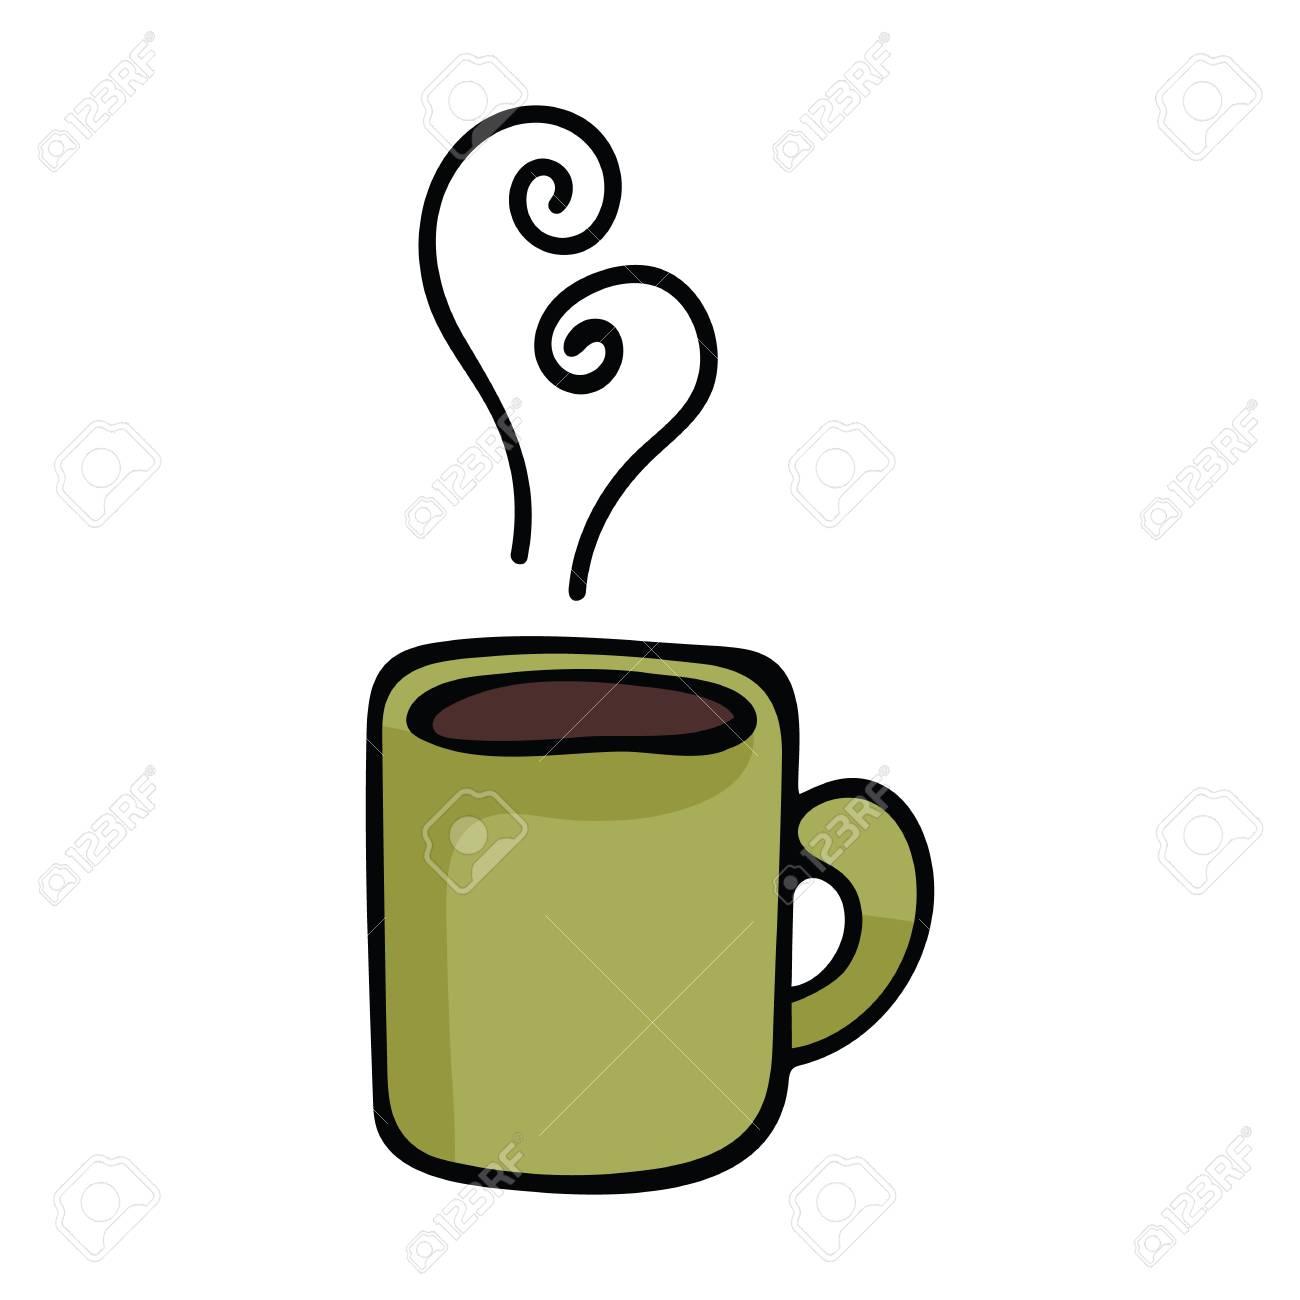 Cute Coffee Mug Cartoon Vector Illustration Motif Set Hand Drawn Royalty Free Cliparts Vectors And Stock Illustration Image 115641609